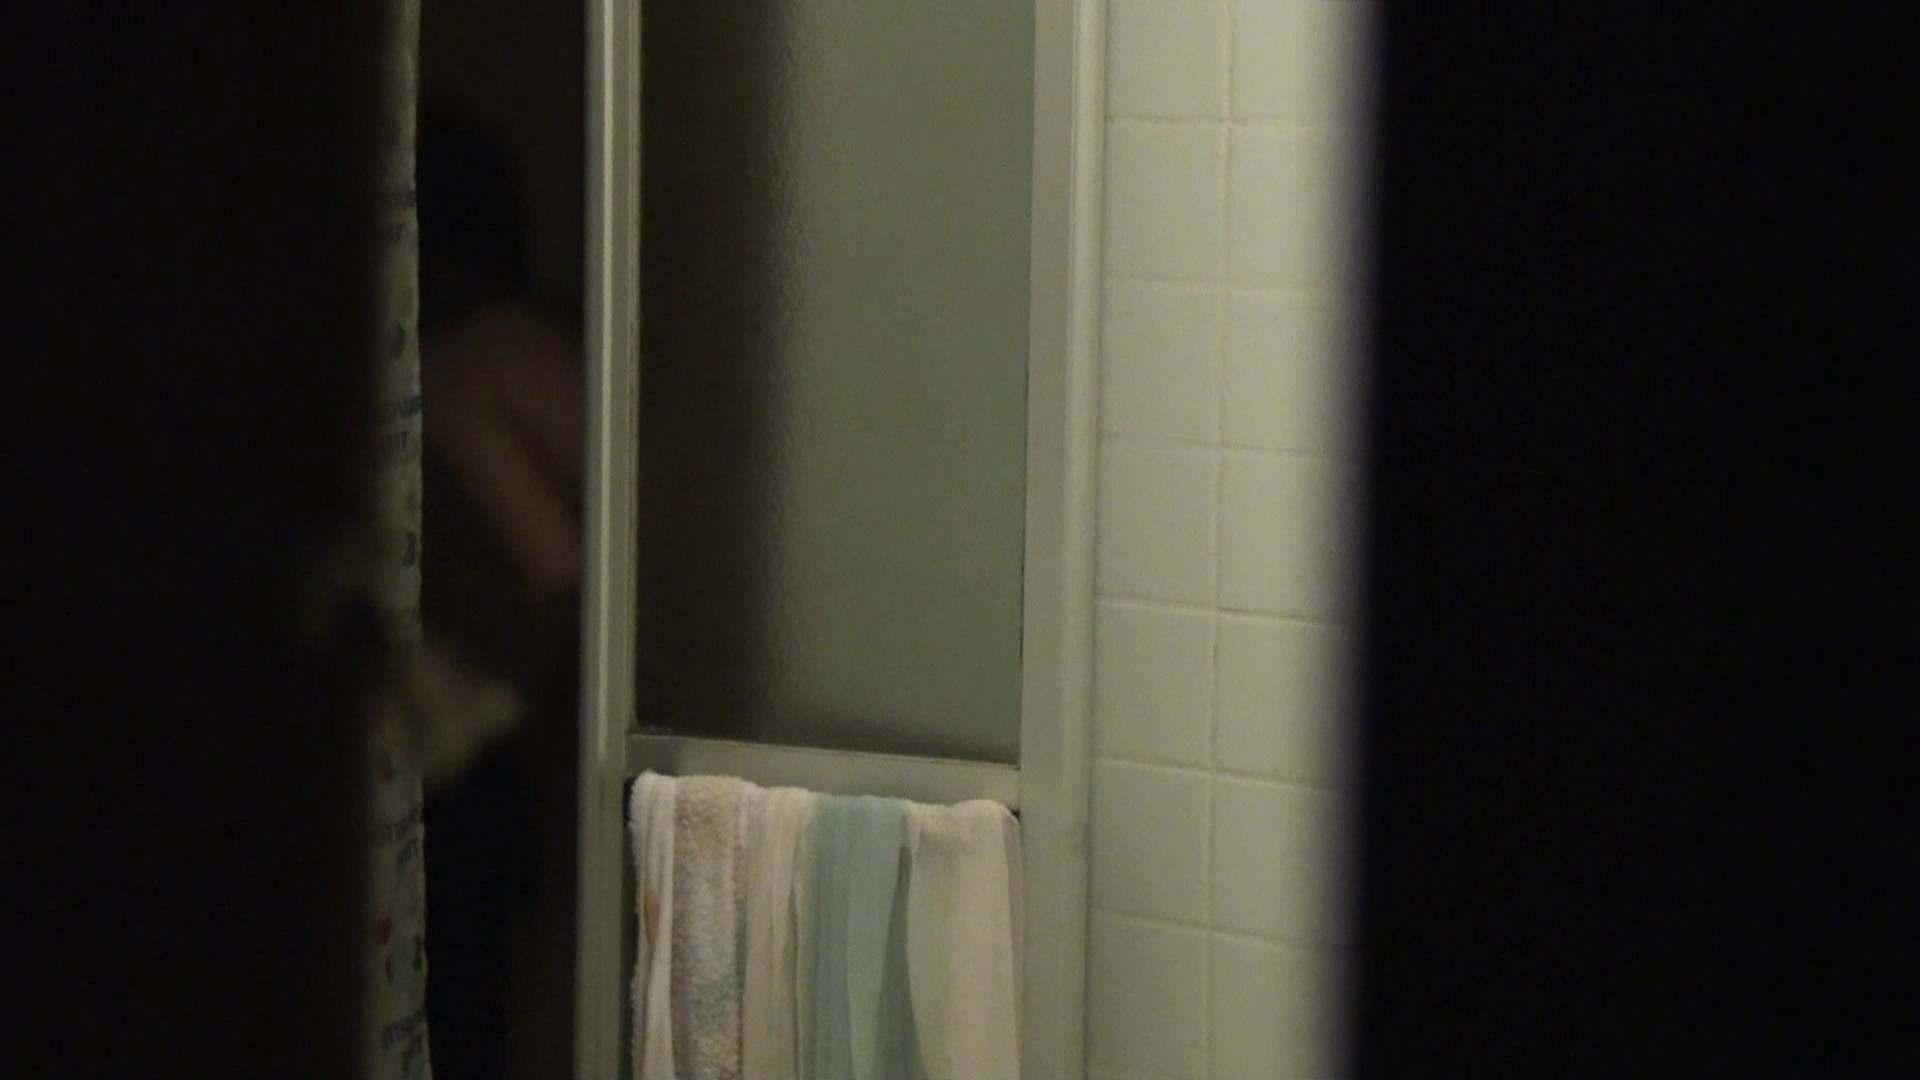 vol.06顔を洗い流す極上お女市さんの裸体をハイビジョンで!風呂上り着替え必見! 美乳 オマンコ動画キャプチャ 68画像 12